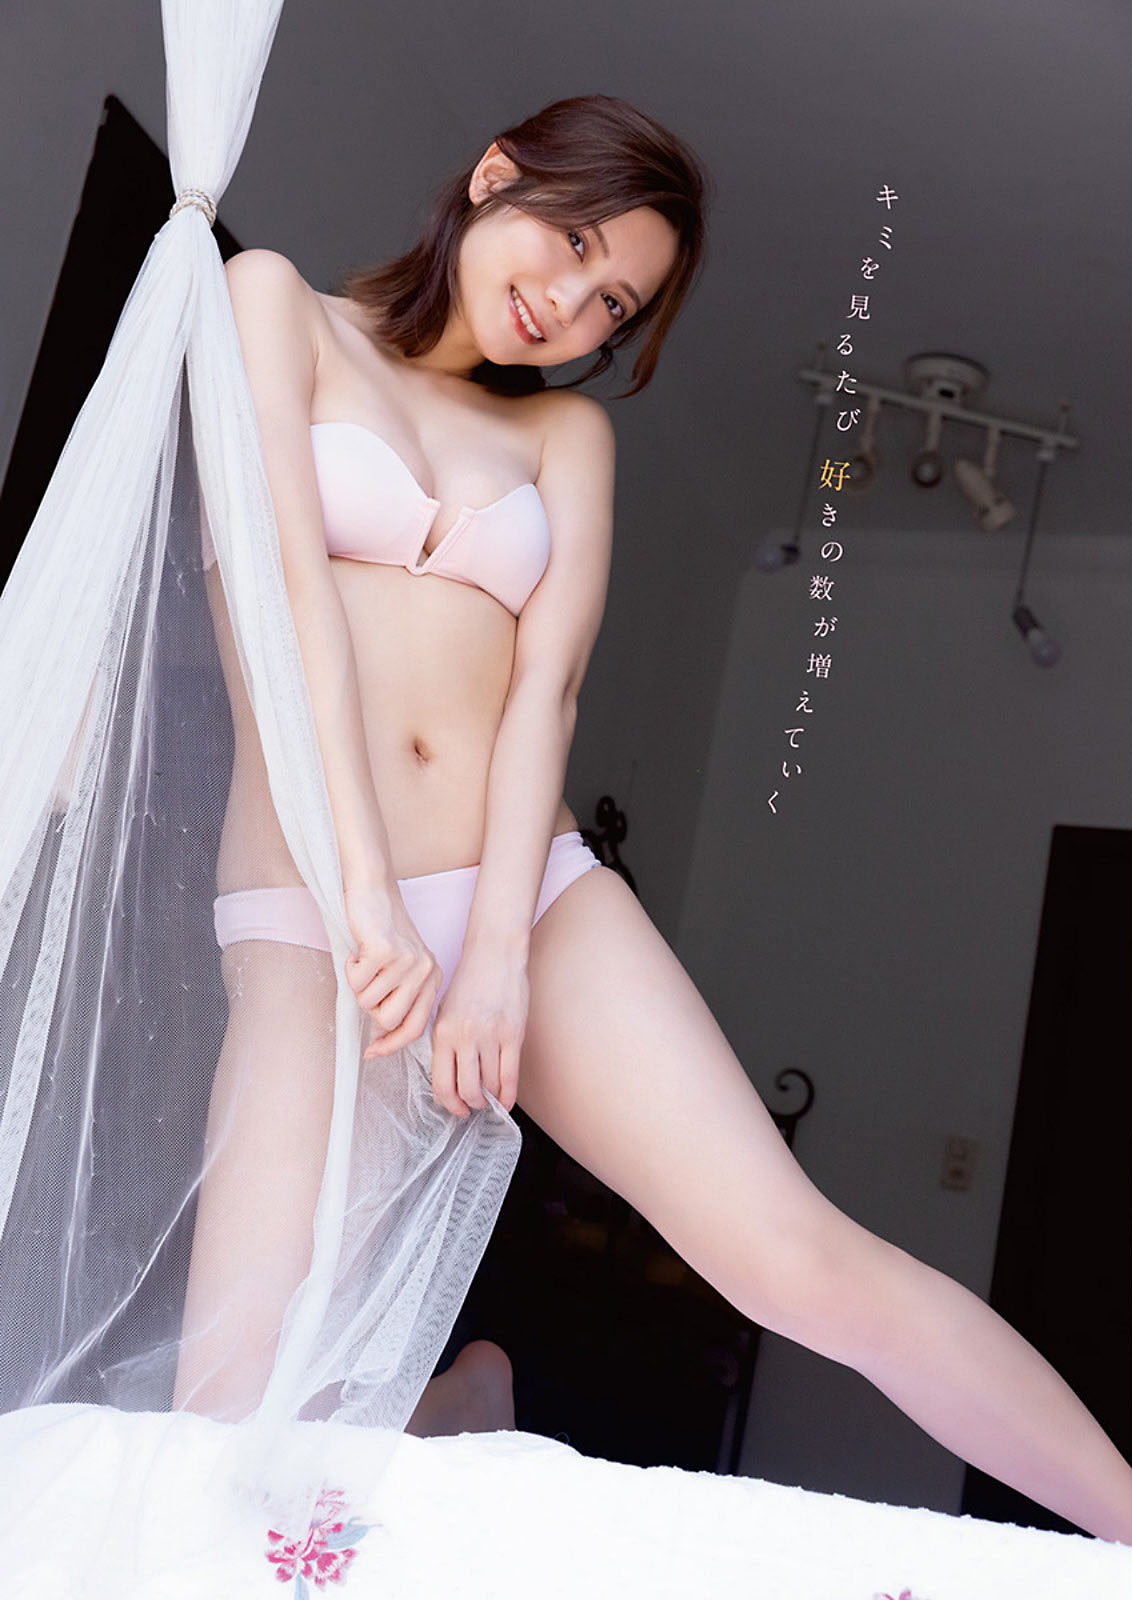 Nashiko Momotsuki Young Animal 211022 04.jpg